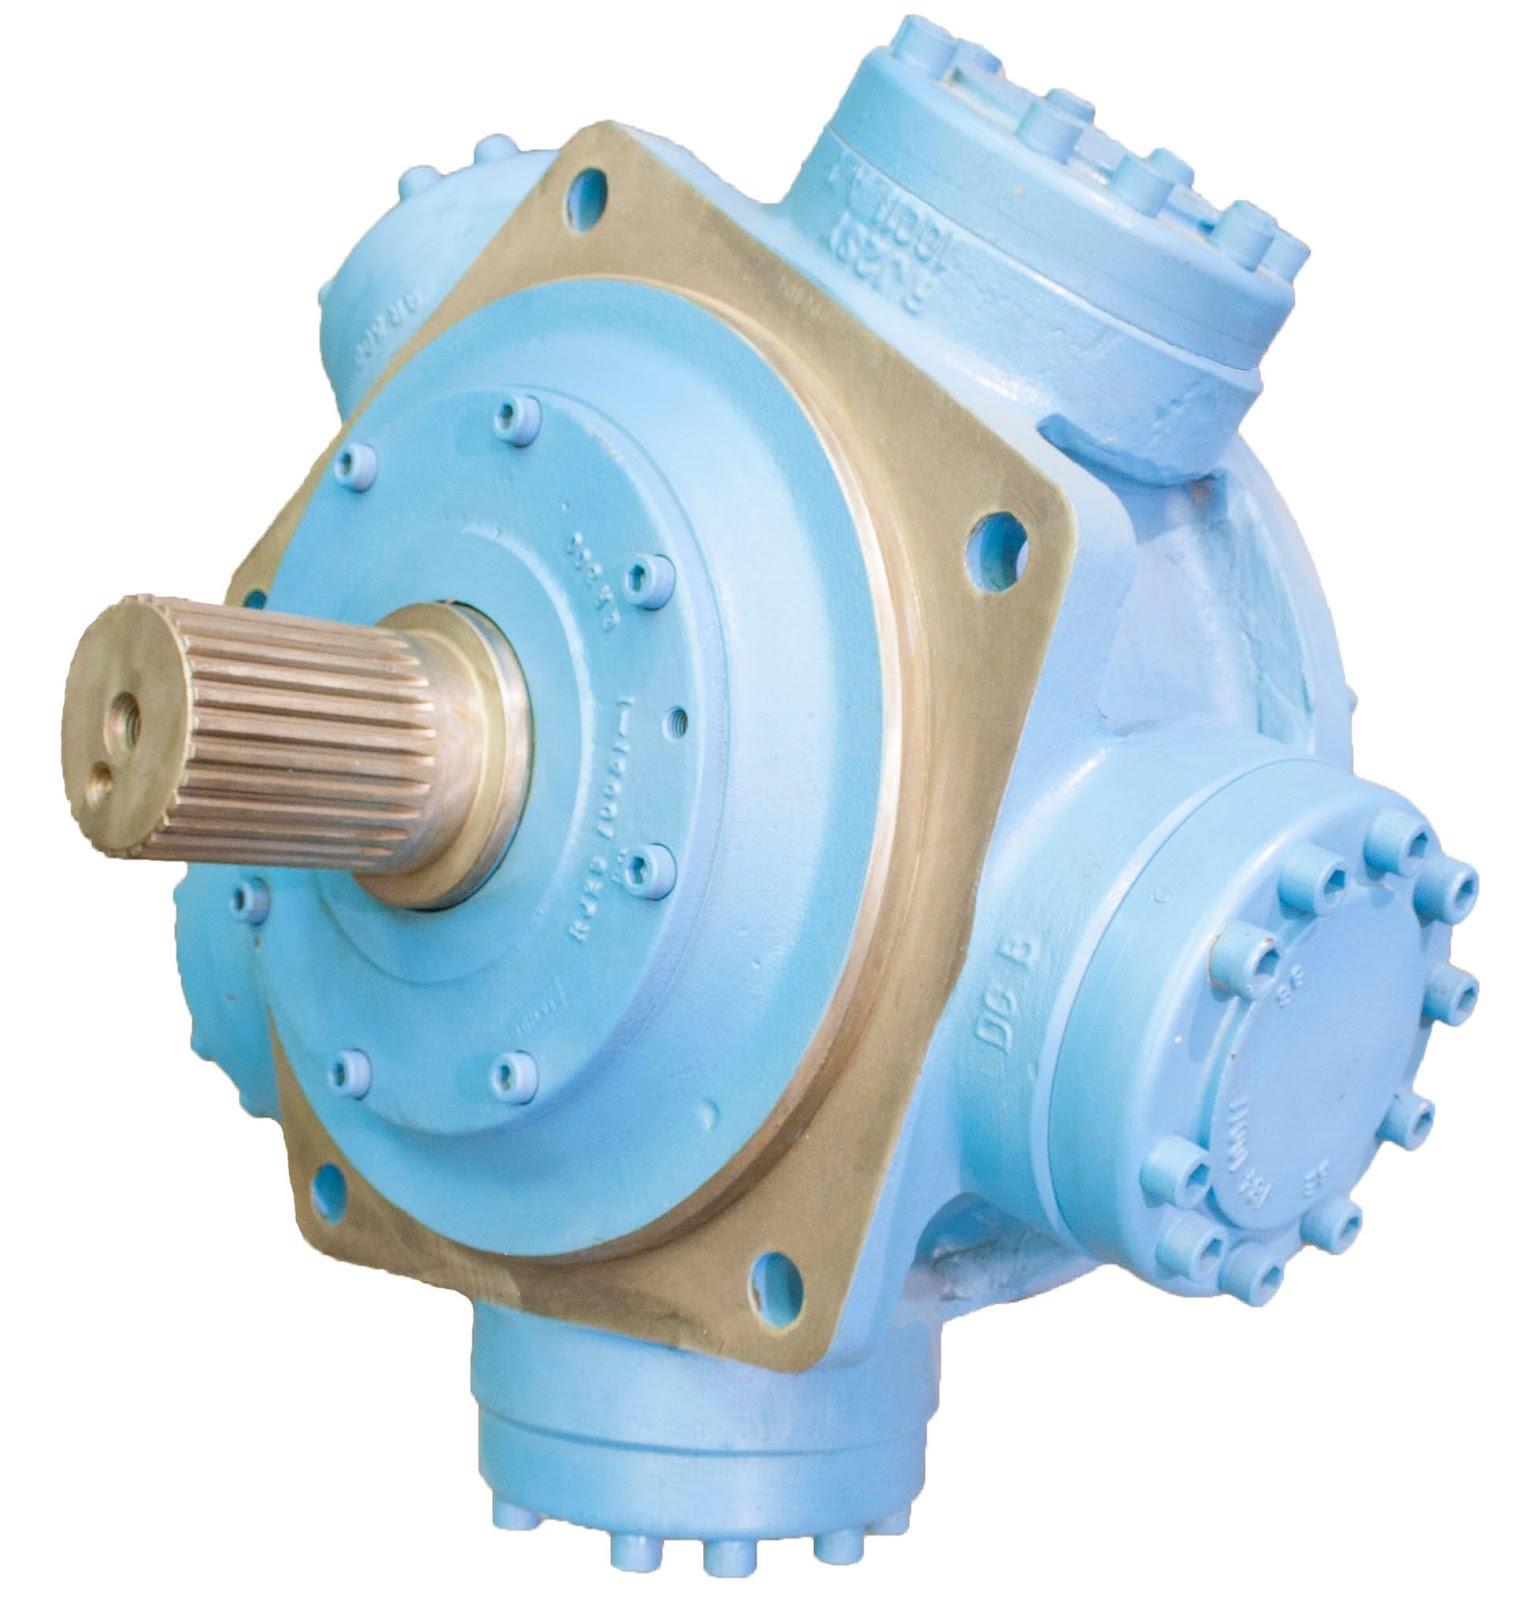 Flint hydraulics inc radial piston motor clearance sale Radial piston hydraulic motor